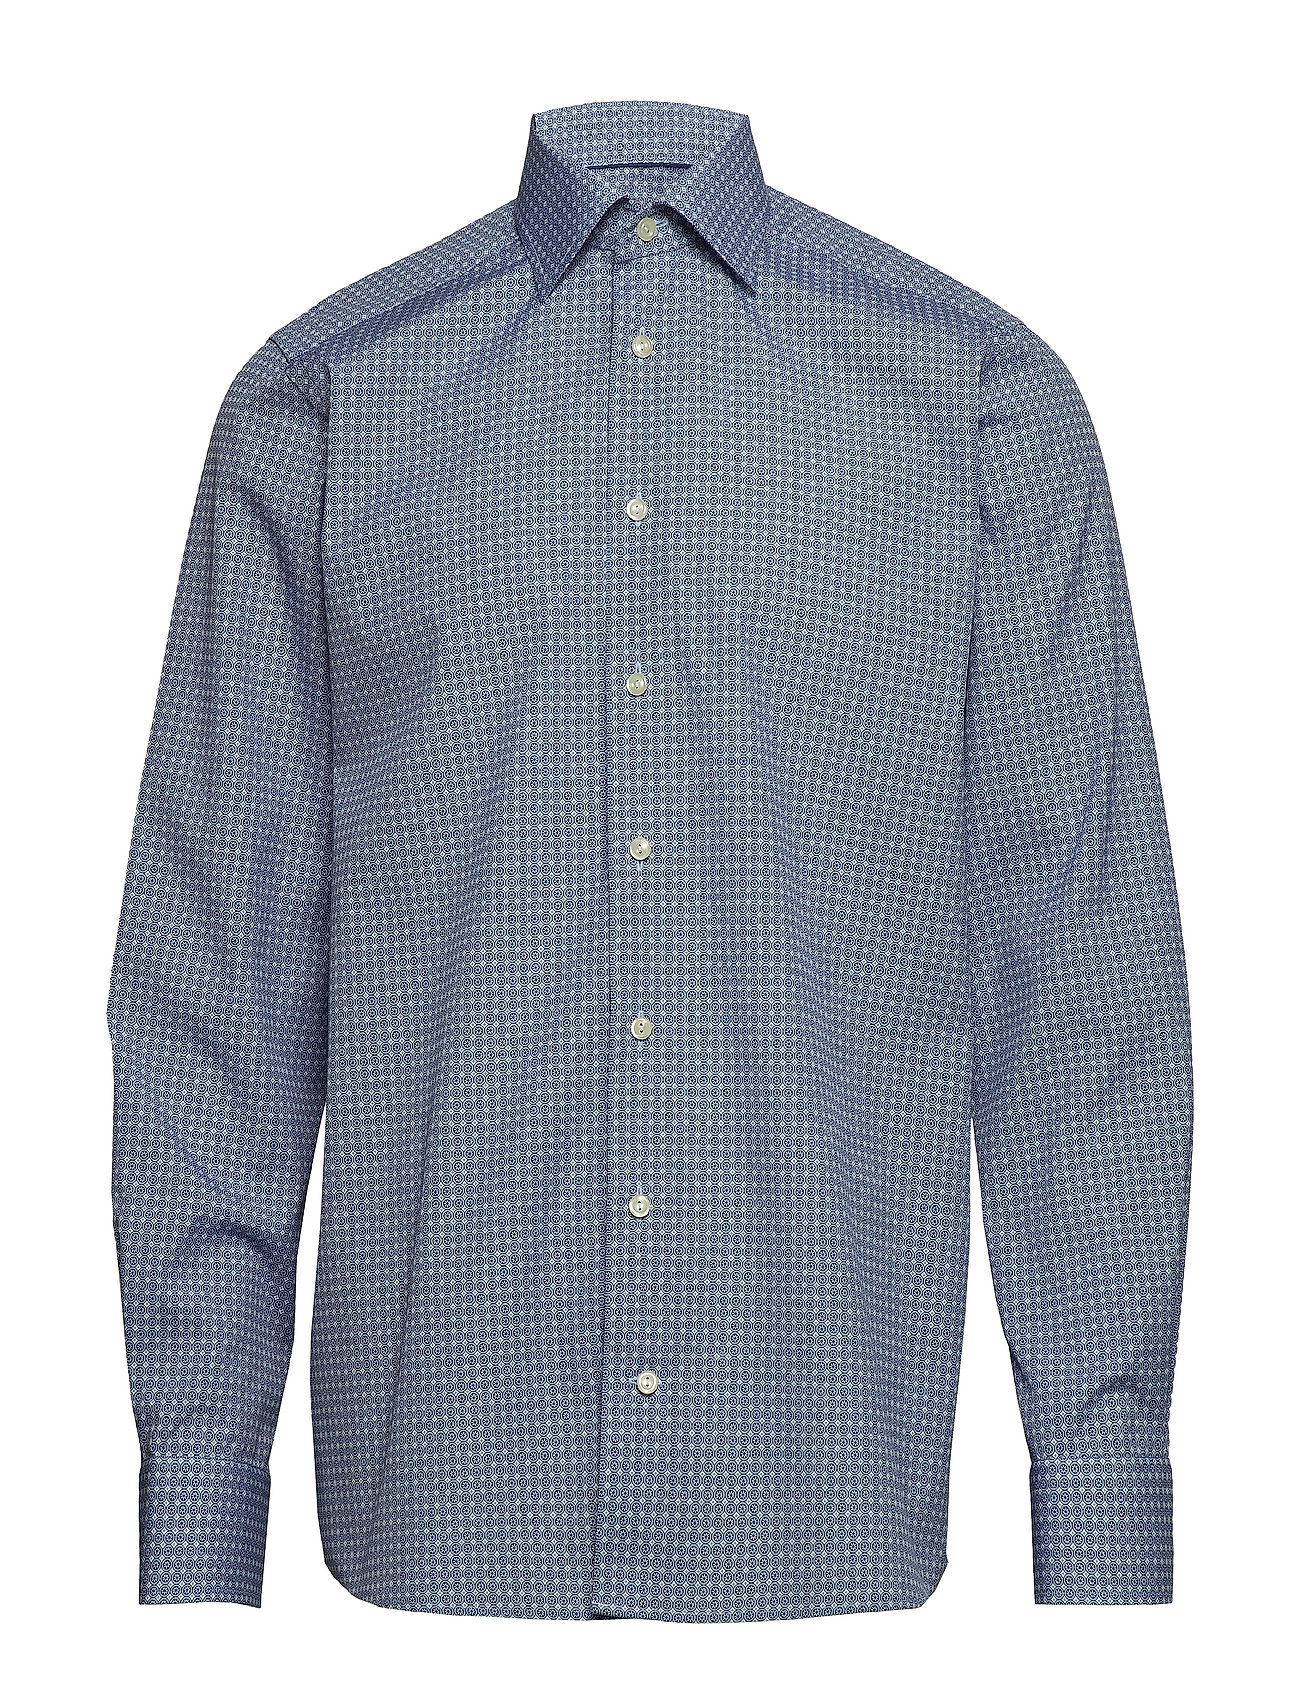 Eton - Geometric Print Shirt - Contemporary fit - chemises business - blue